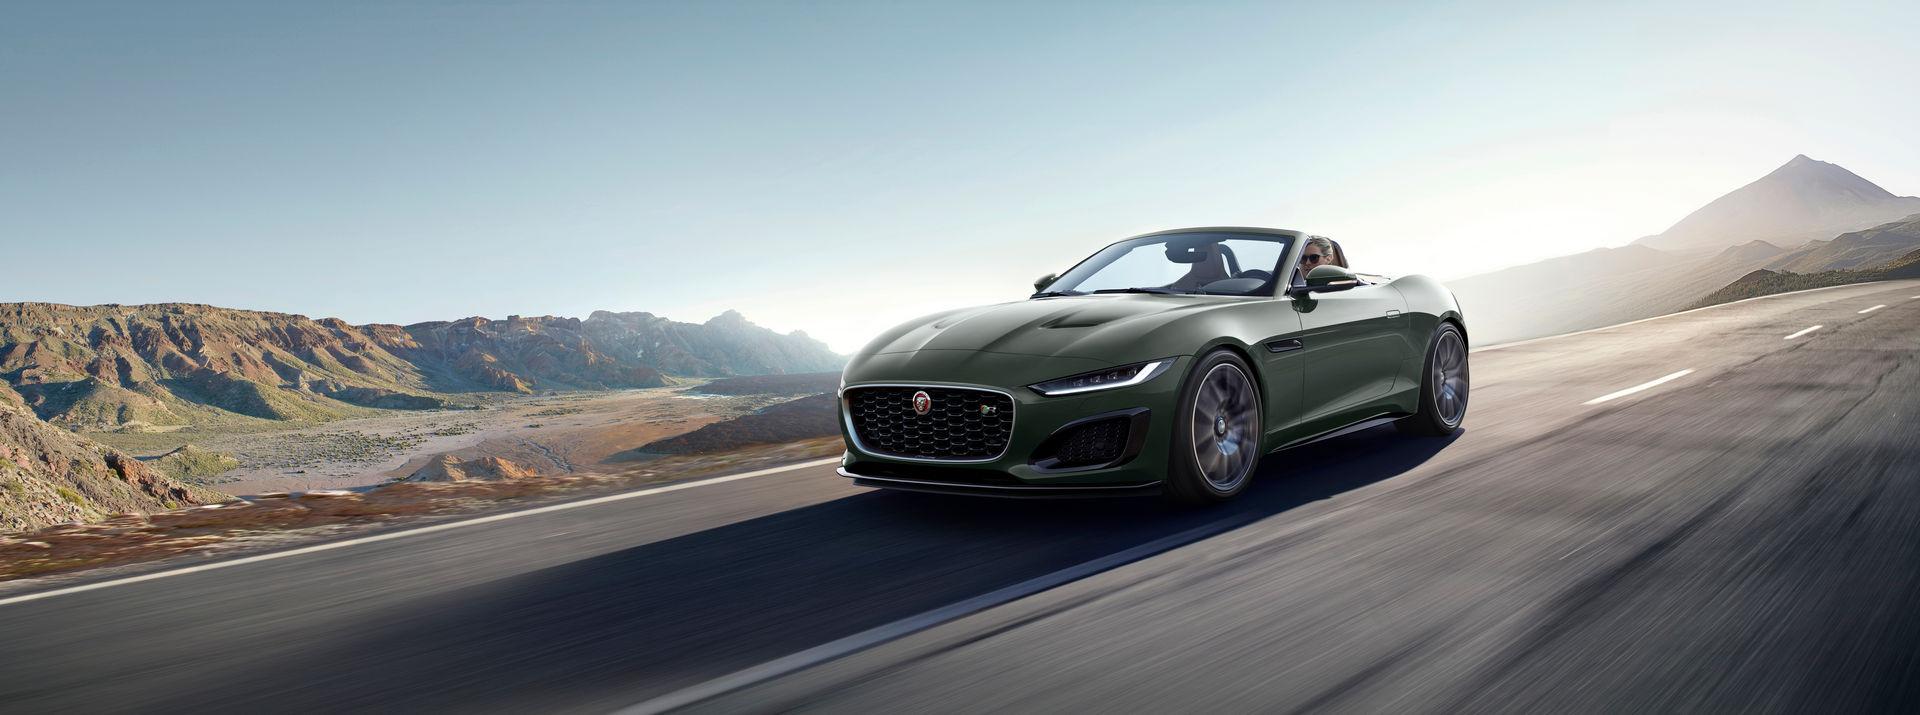 Jaguar-F-Type-Heritage-60-Edition-3